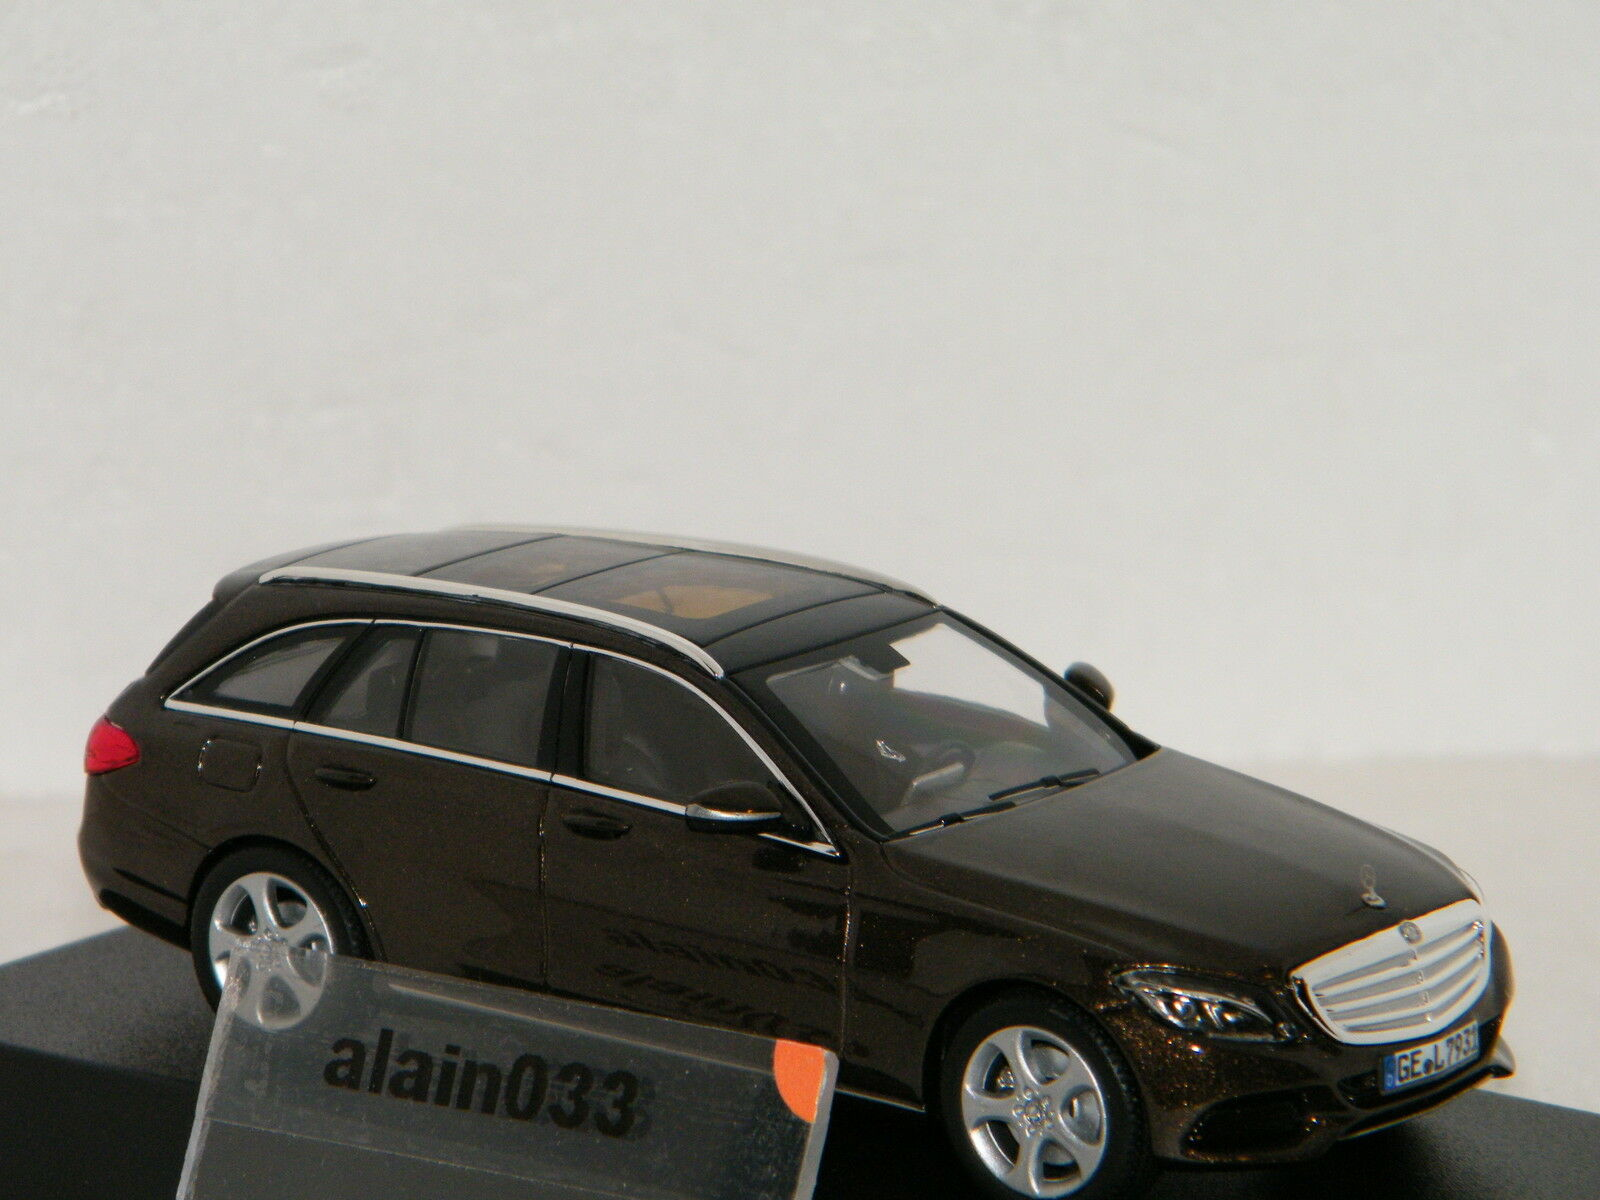 Mercedes-Benz C-Class Estate 2014 marron metallic NOREV 1 43 Ref 351322